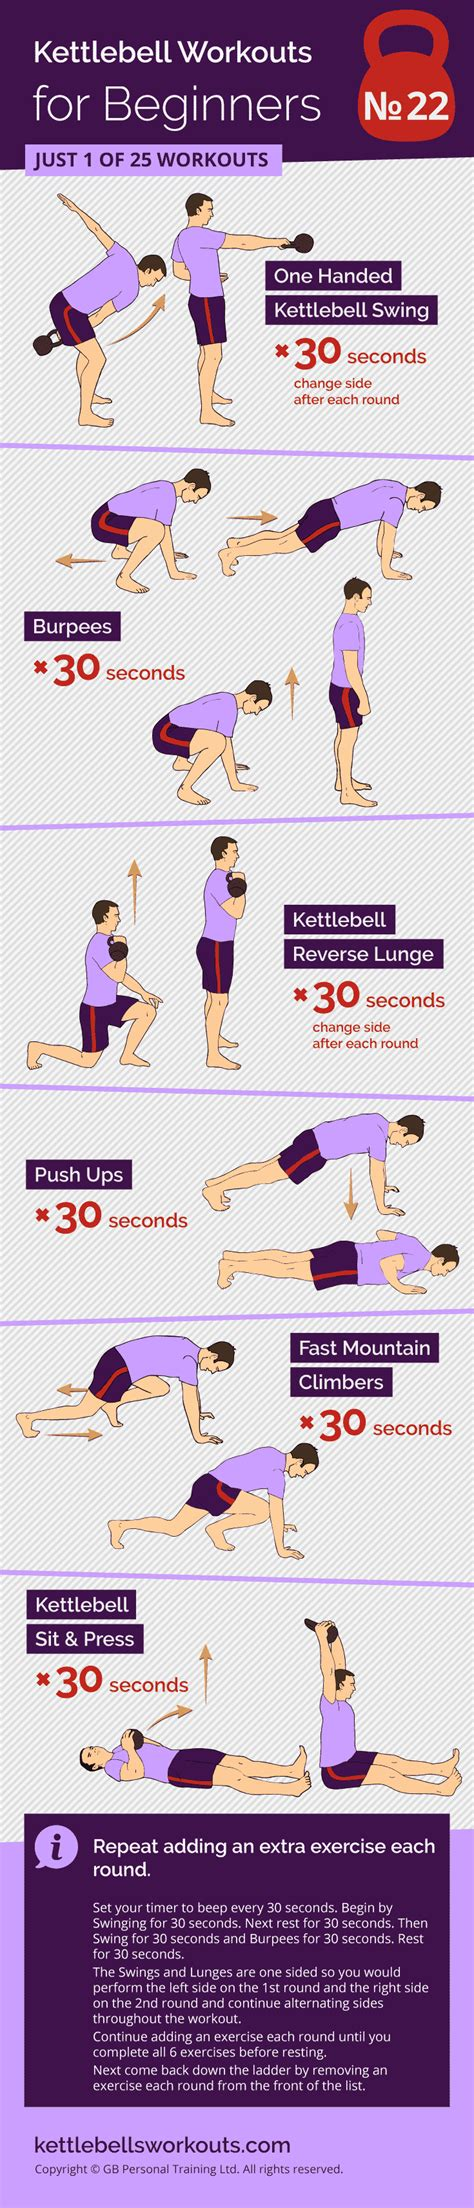 kettlebell workout ladder single movement sided workouts reverse